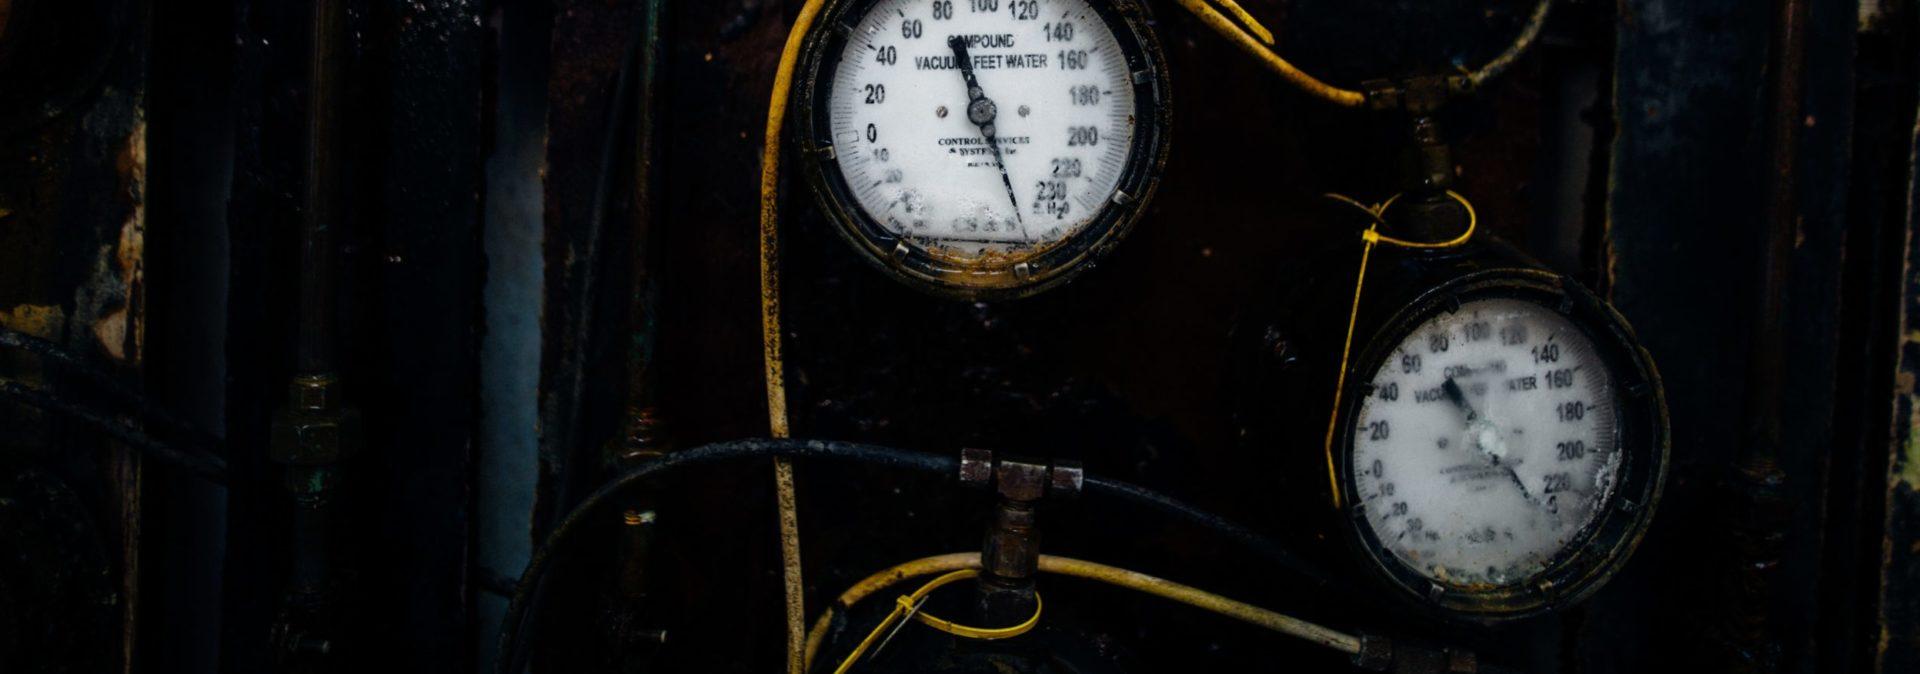 Messgeräteservice